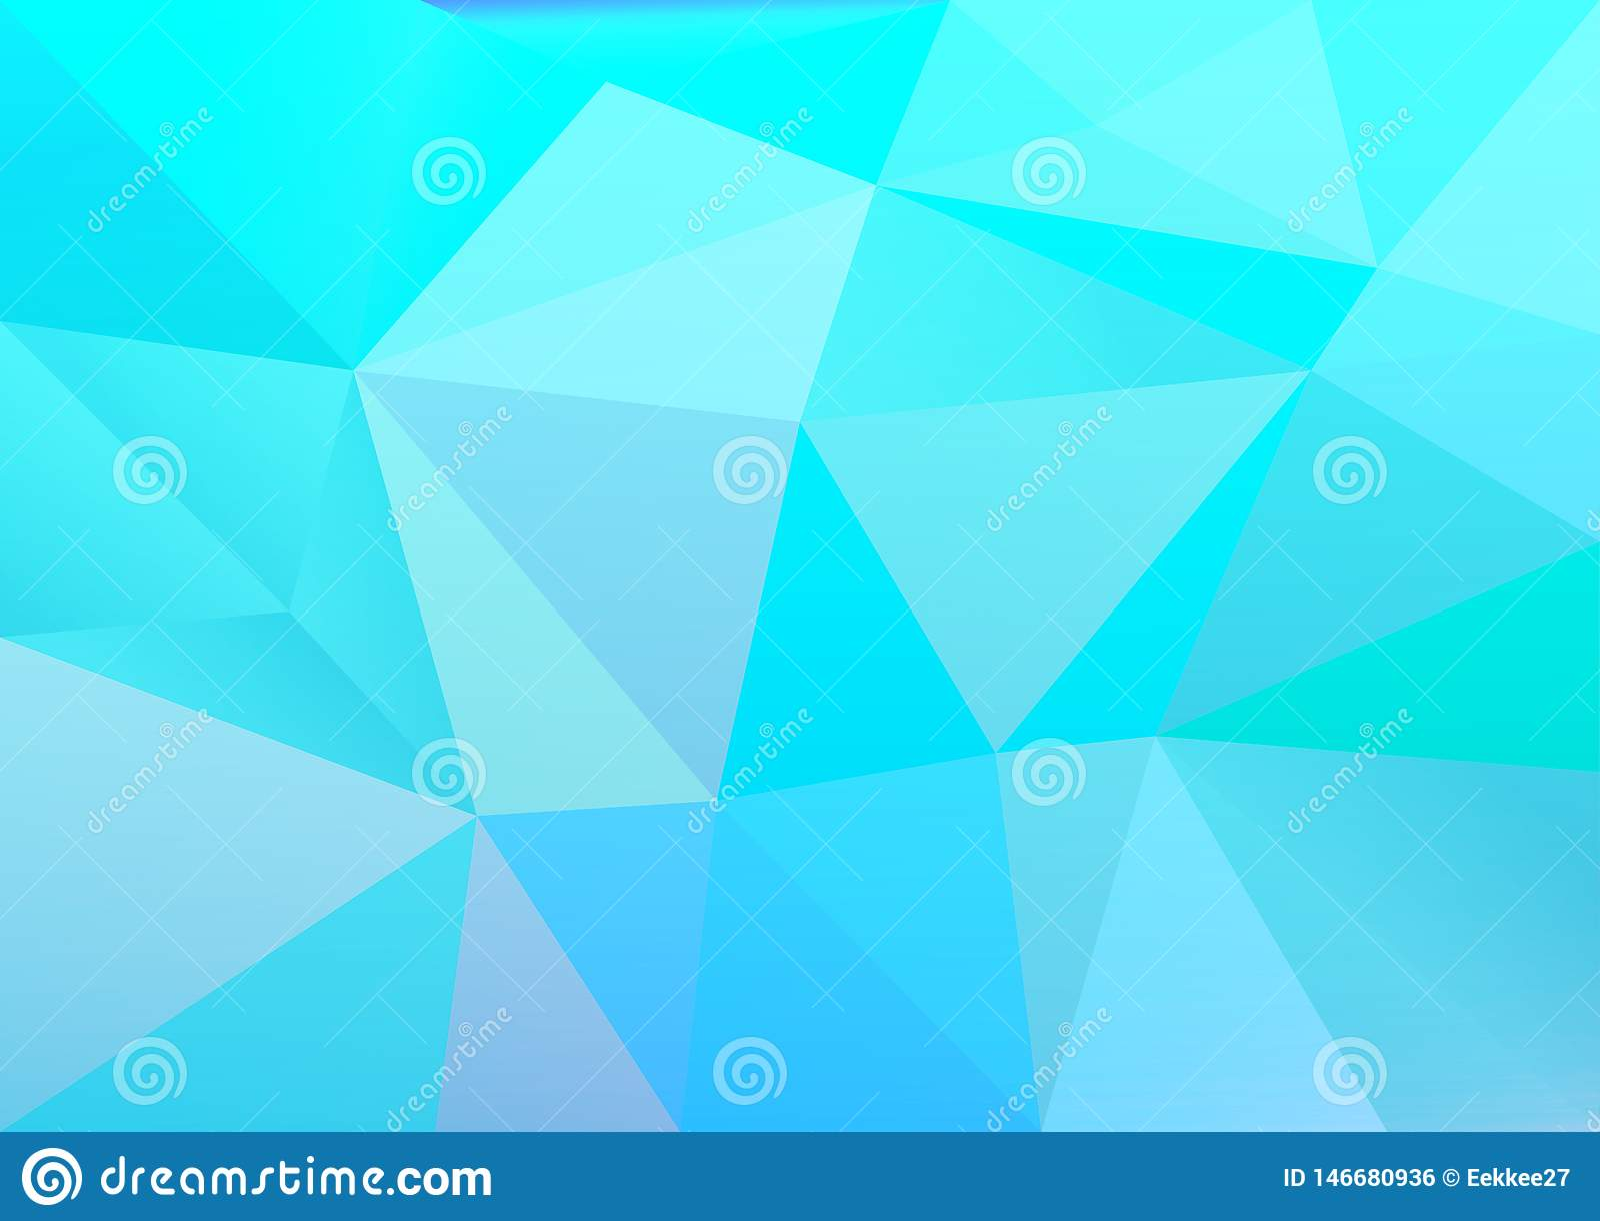 Abstrakte Hintergrunddesign-Vektorillustration